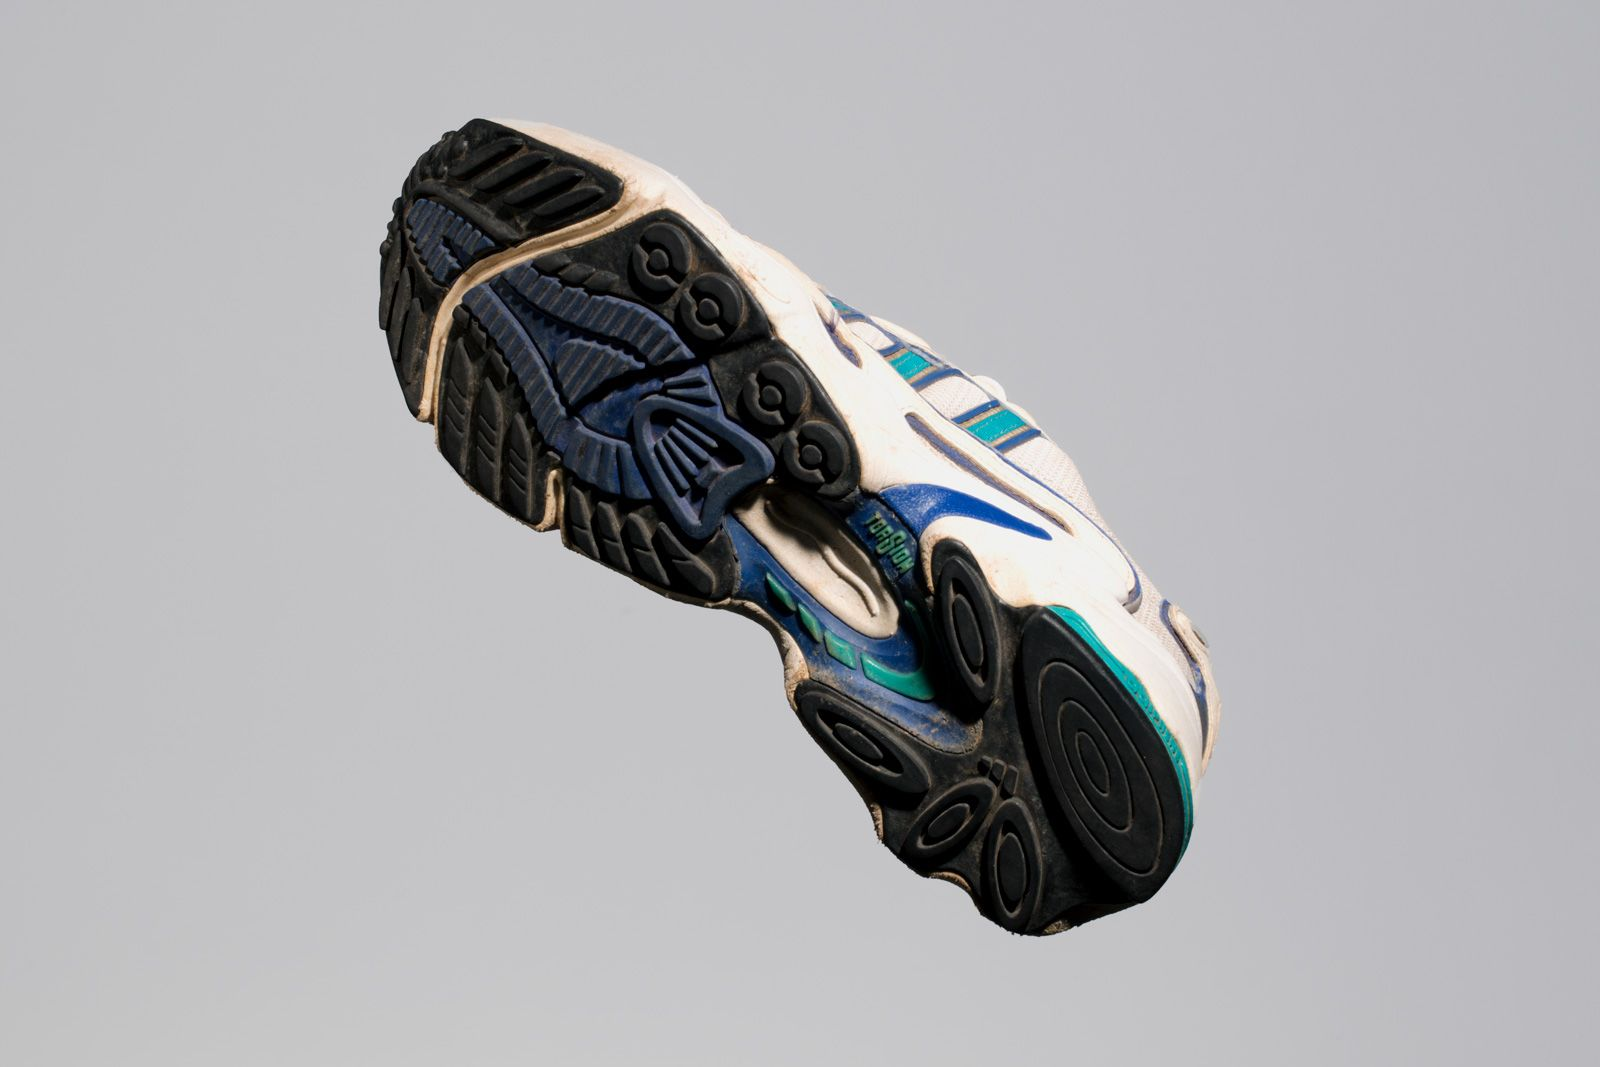 adidas-ozweego-geneology-13